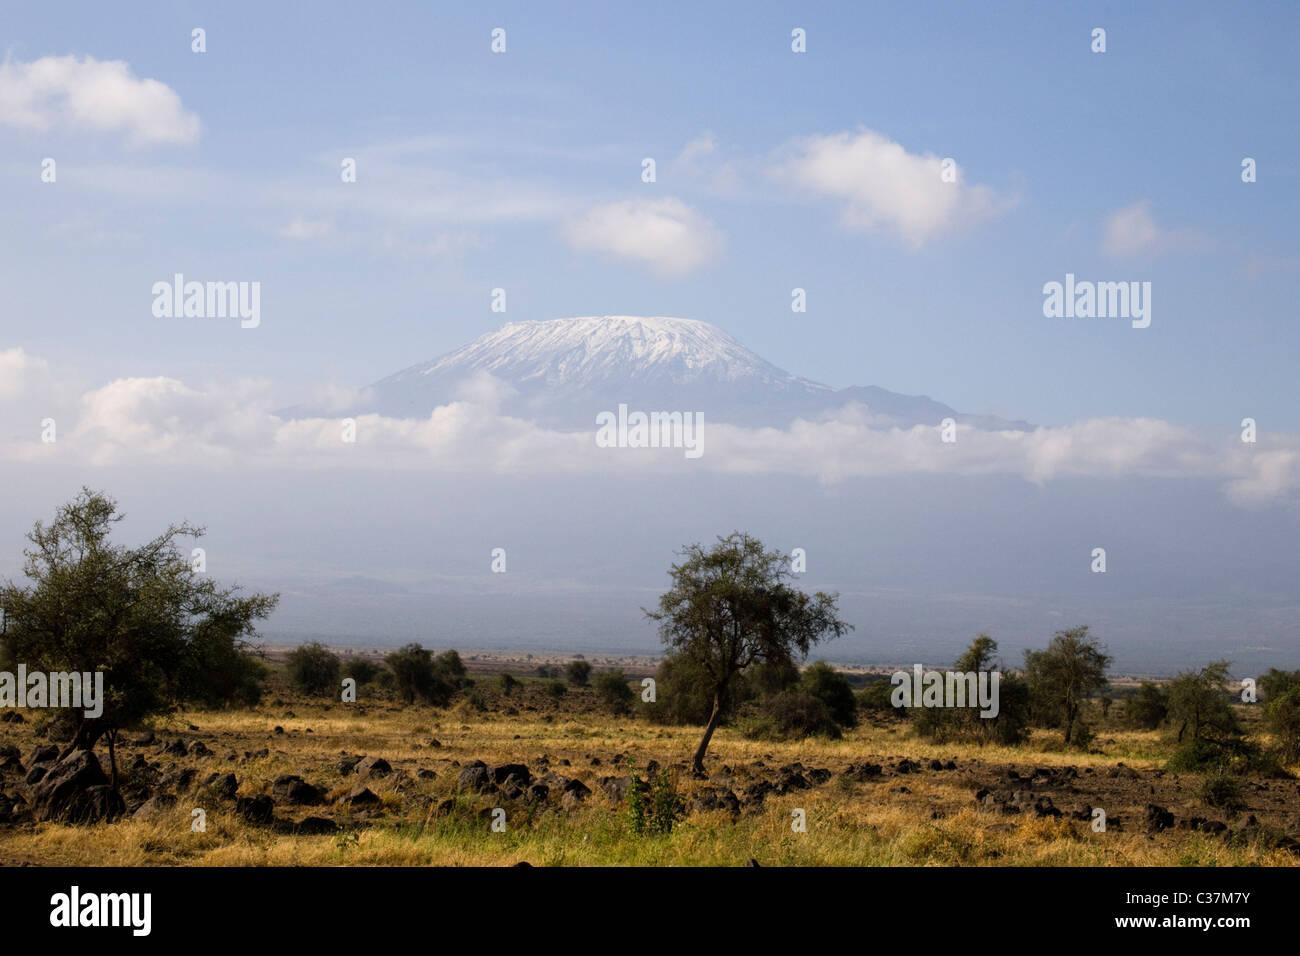 Mount Kilimanjaro as seen from Amboseli National Park, Kenya, East Africa - Stock Image